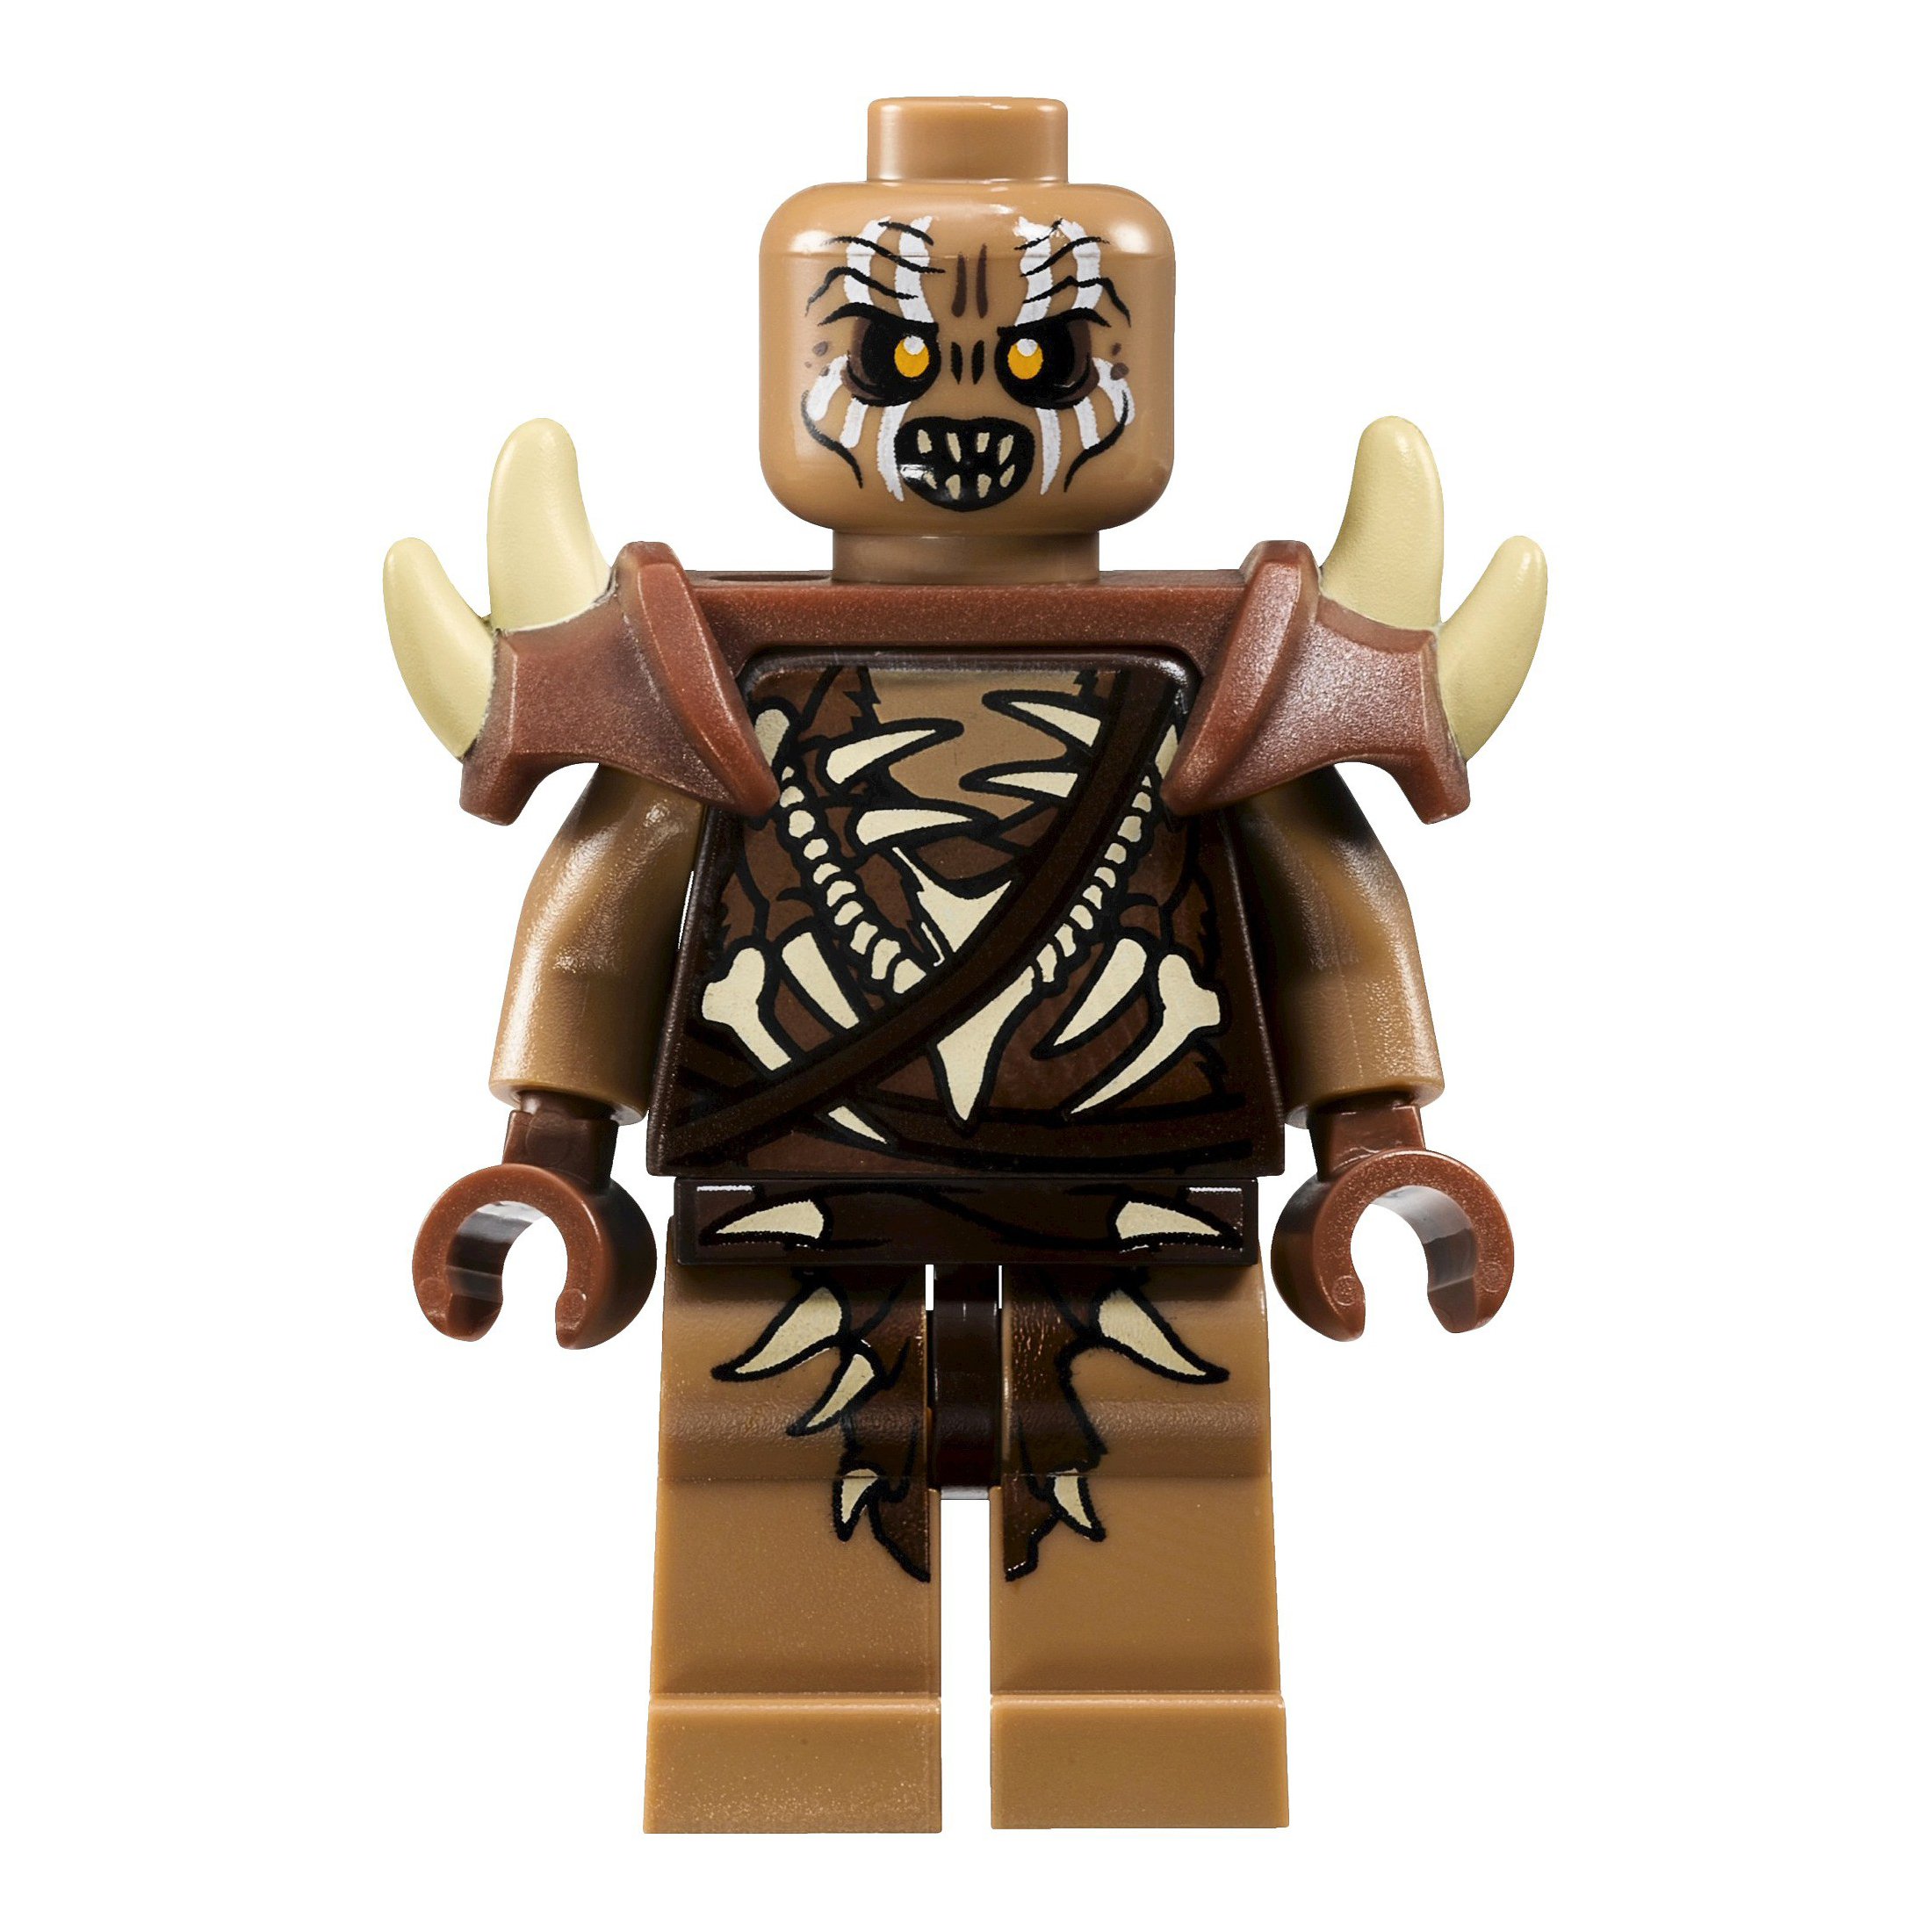 Orc Lord Of The Rings Uruk Hai Gundabad Orc - LEGO Lo...